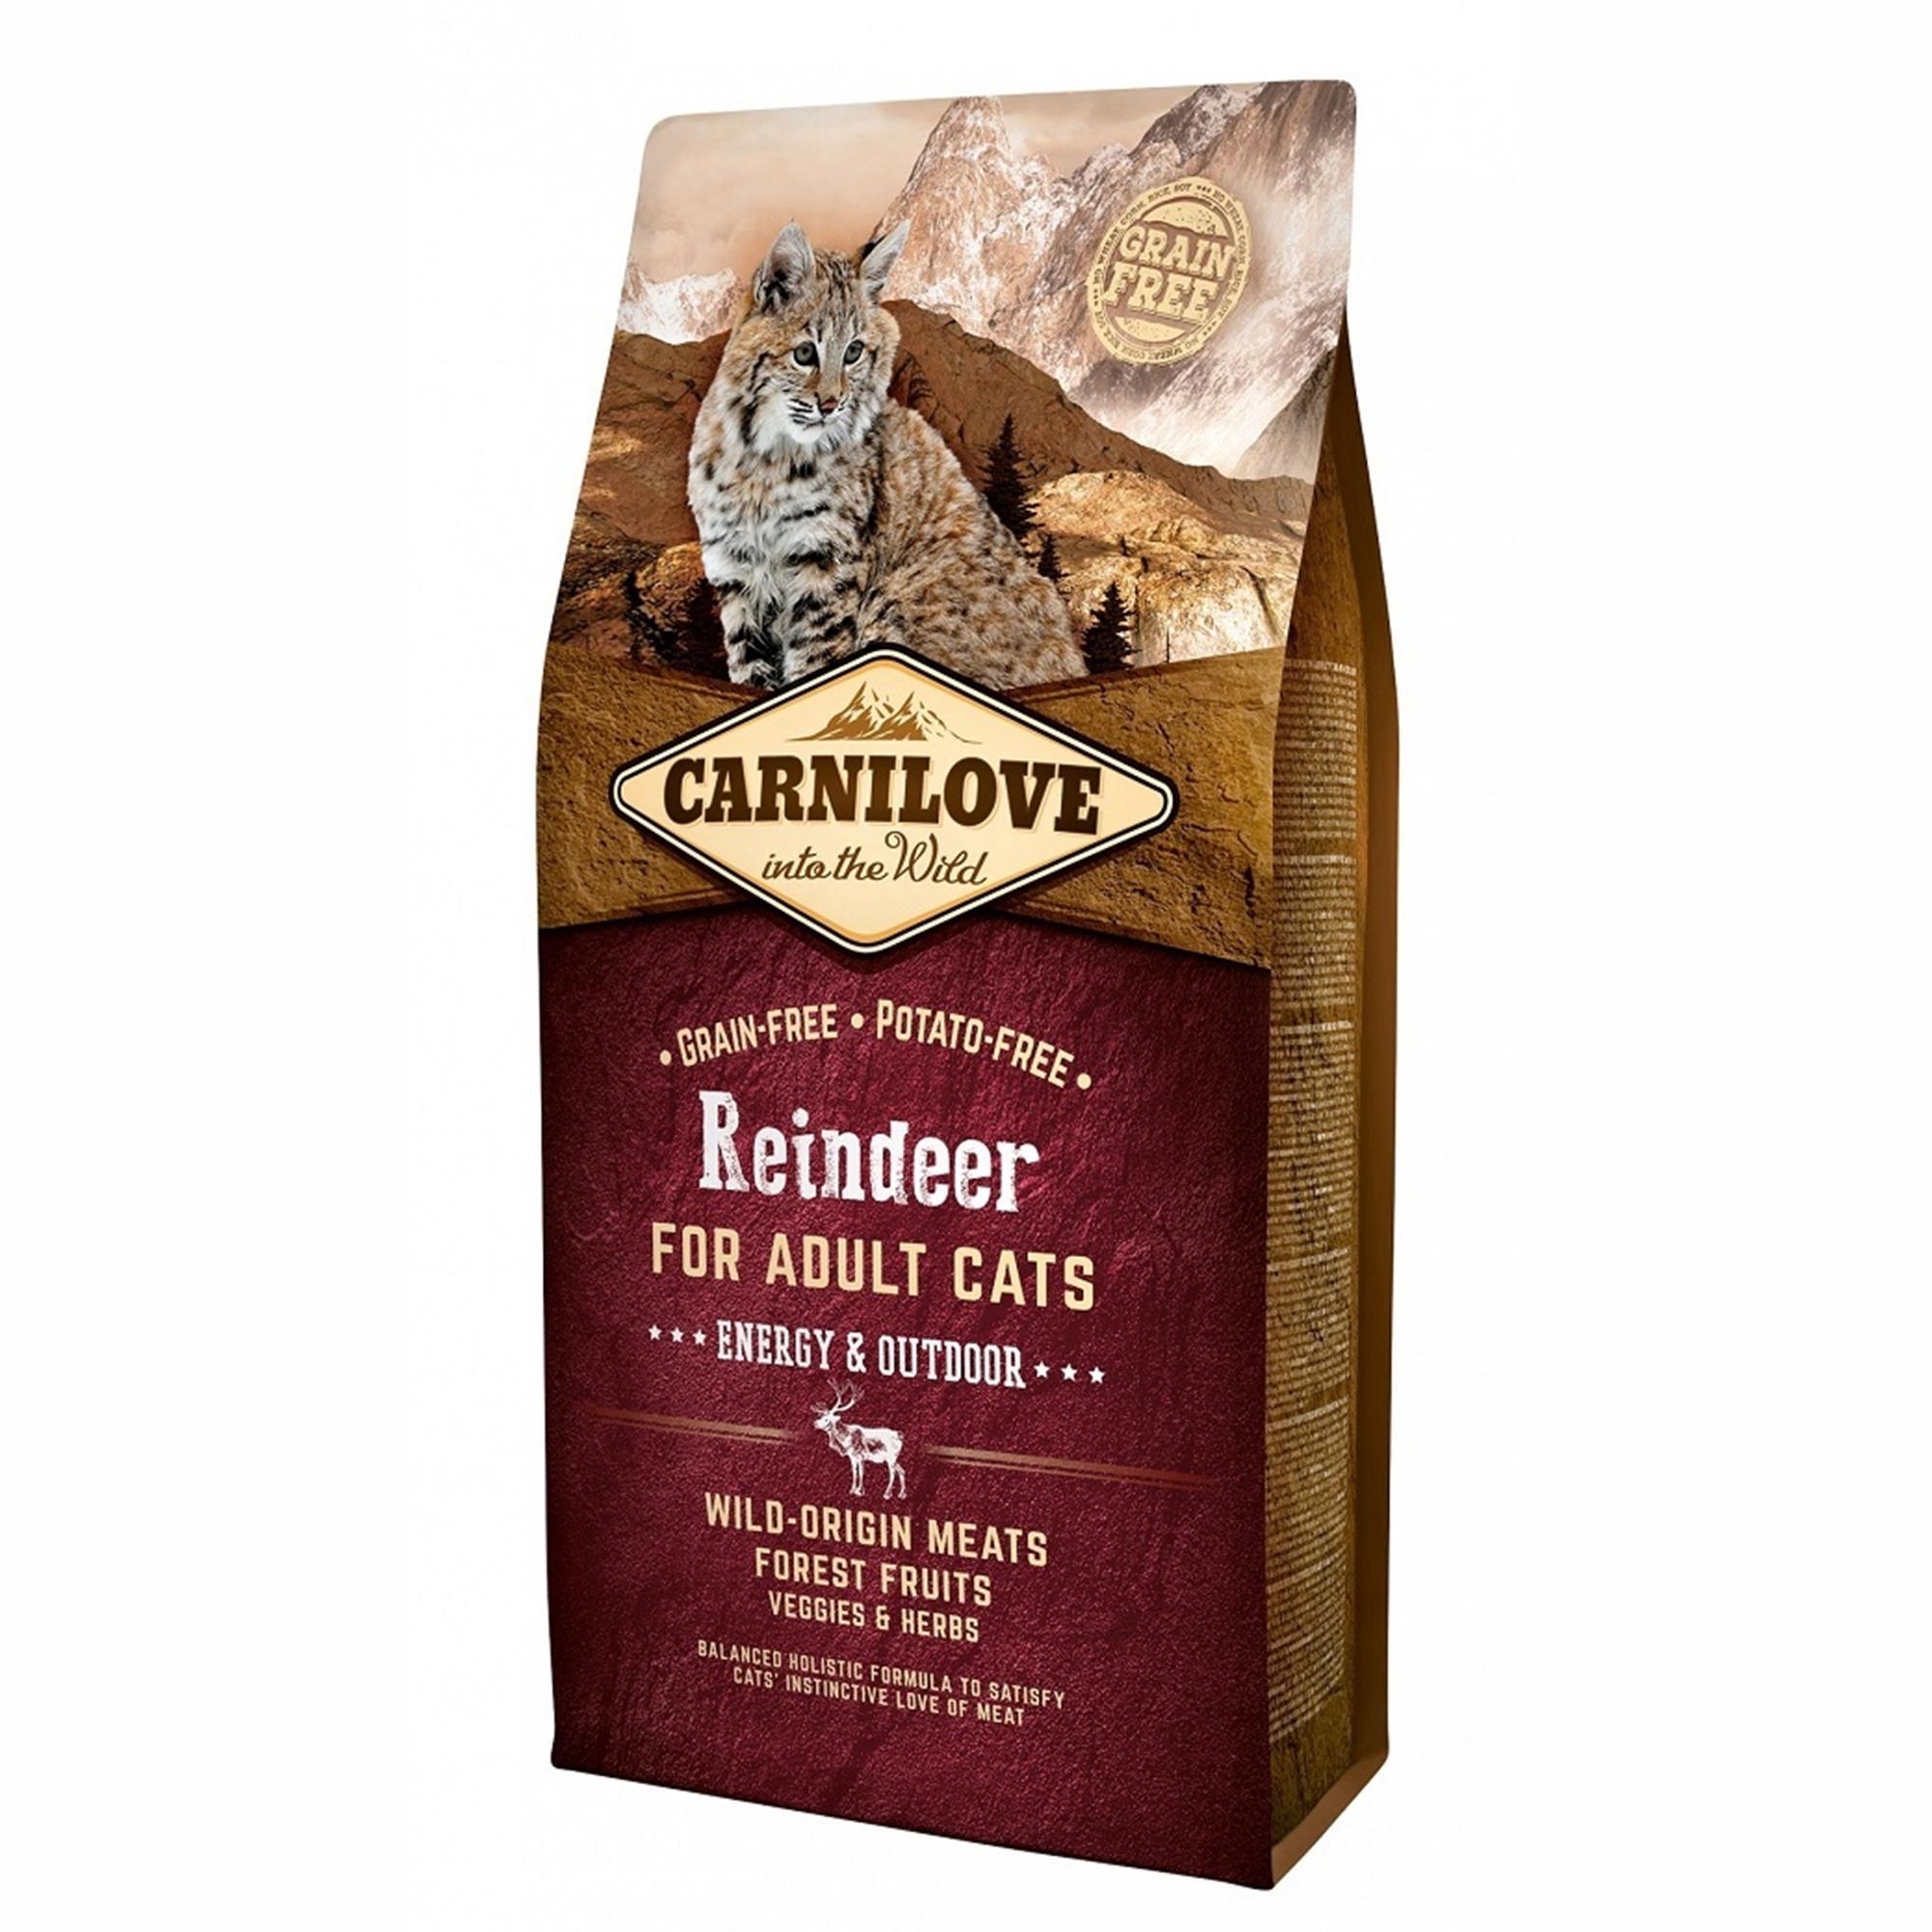 Carnilove Reindeer Cats Energy & Outdoor, 6 kg imagine